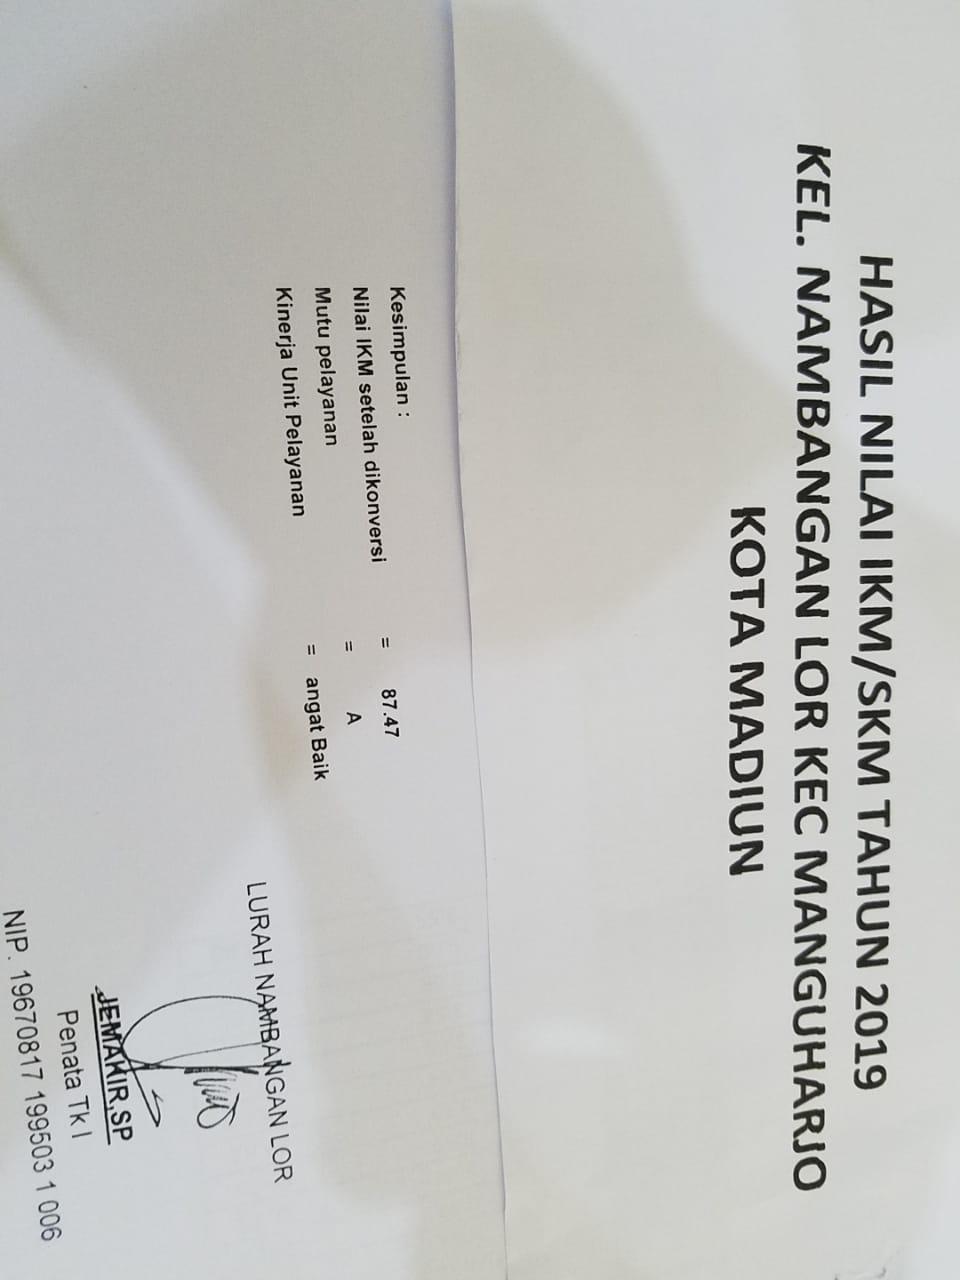 Hasil Nilai SKM /IKM dari Kelurahan Nambangan Lor Tahun 2019